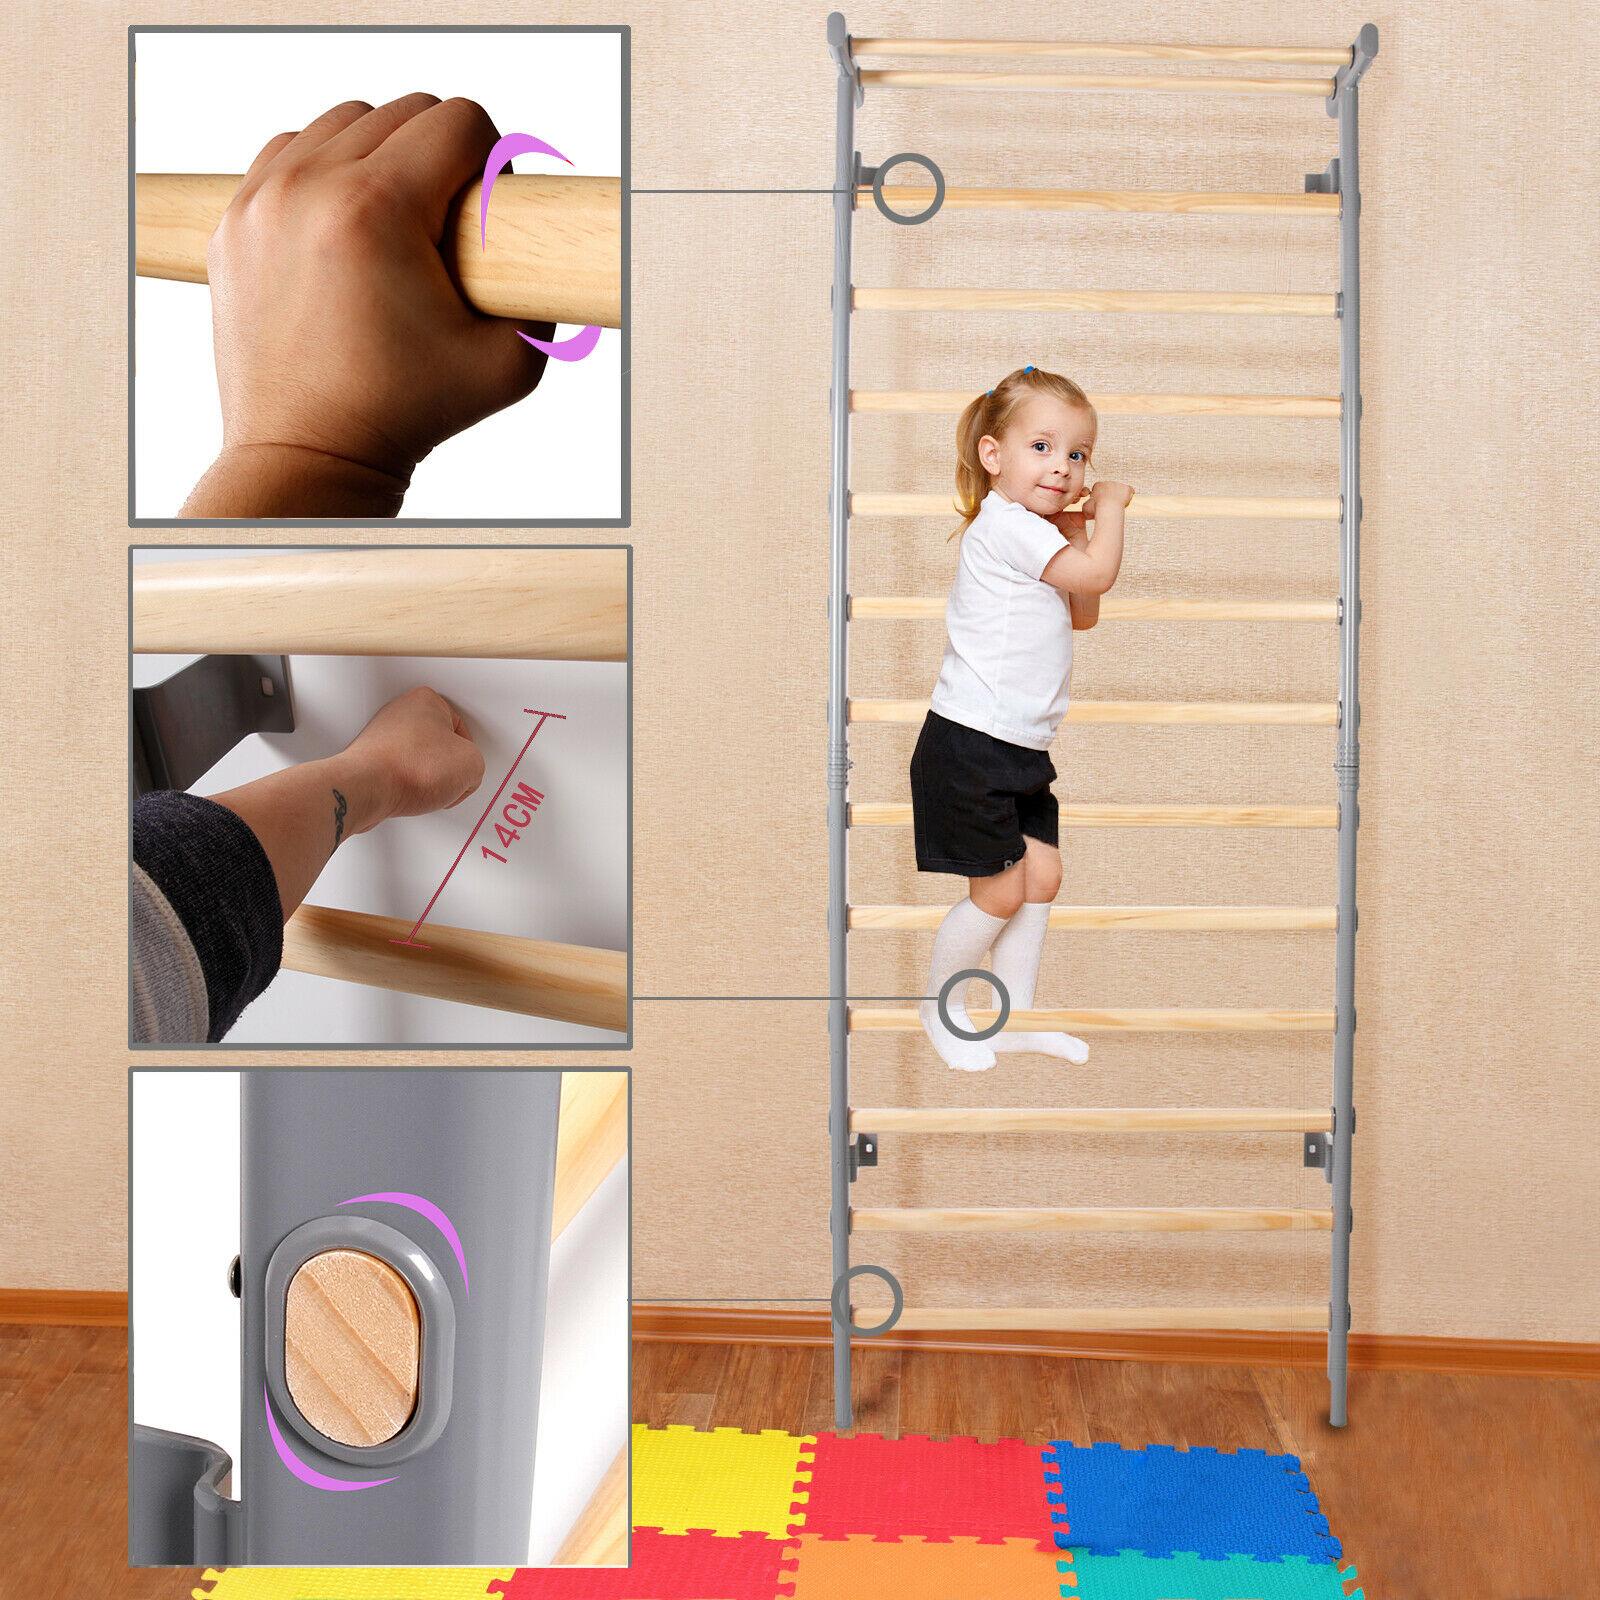 Full Size of Sprossenwand Kinderzimmer Turnwand Kletterwand Klettergerst Sofa Regale Regal Weiß Kinderzimmer Sprossenwand Kinderzimmer